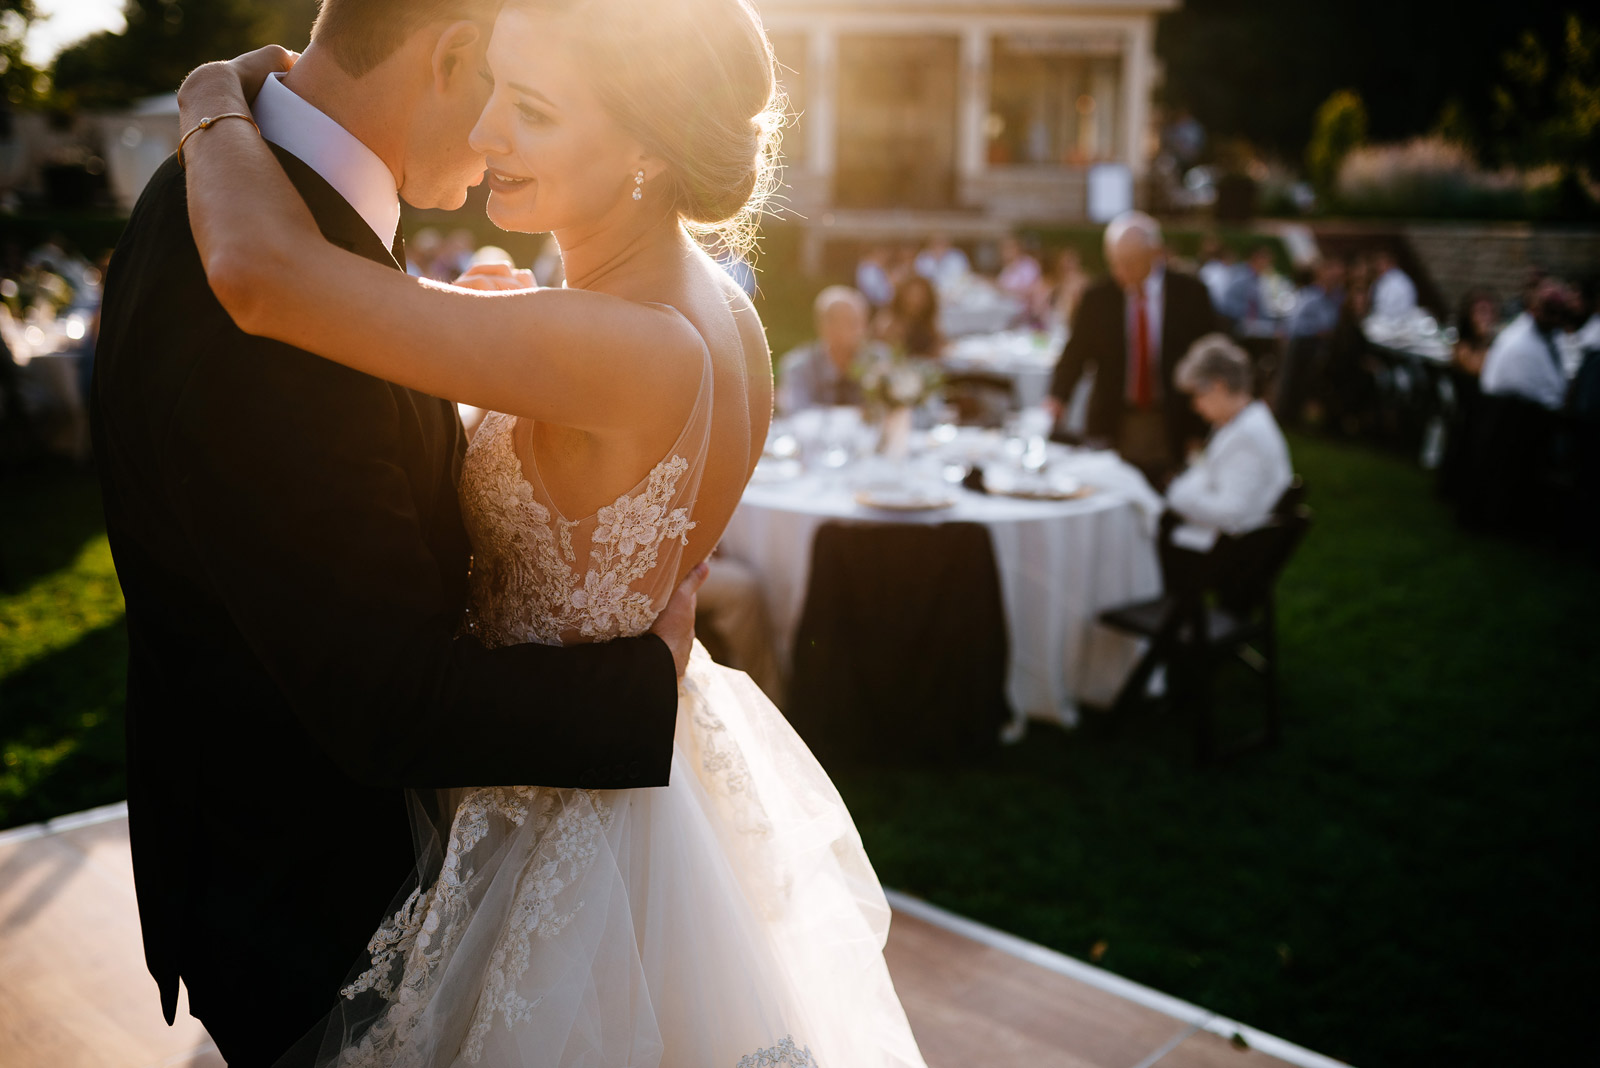 bride groom first dance zenner house wedding